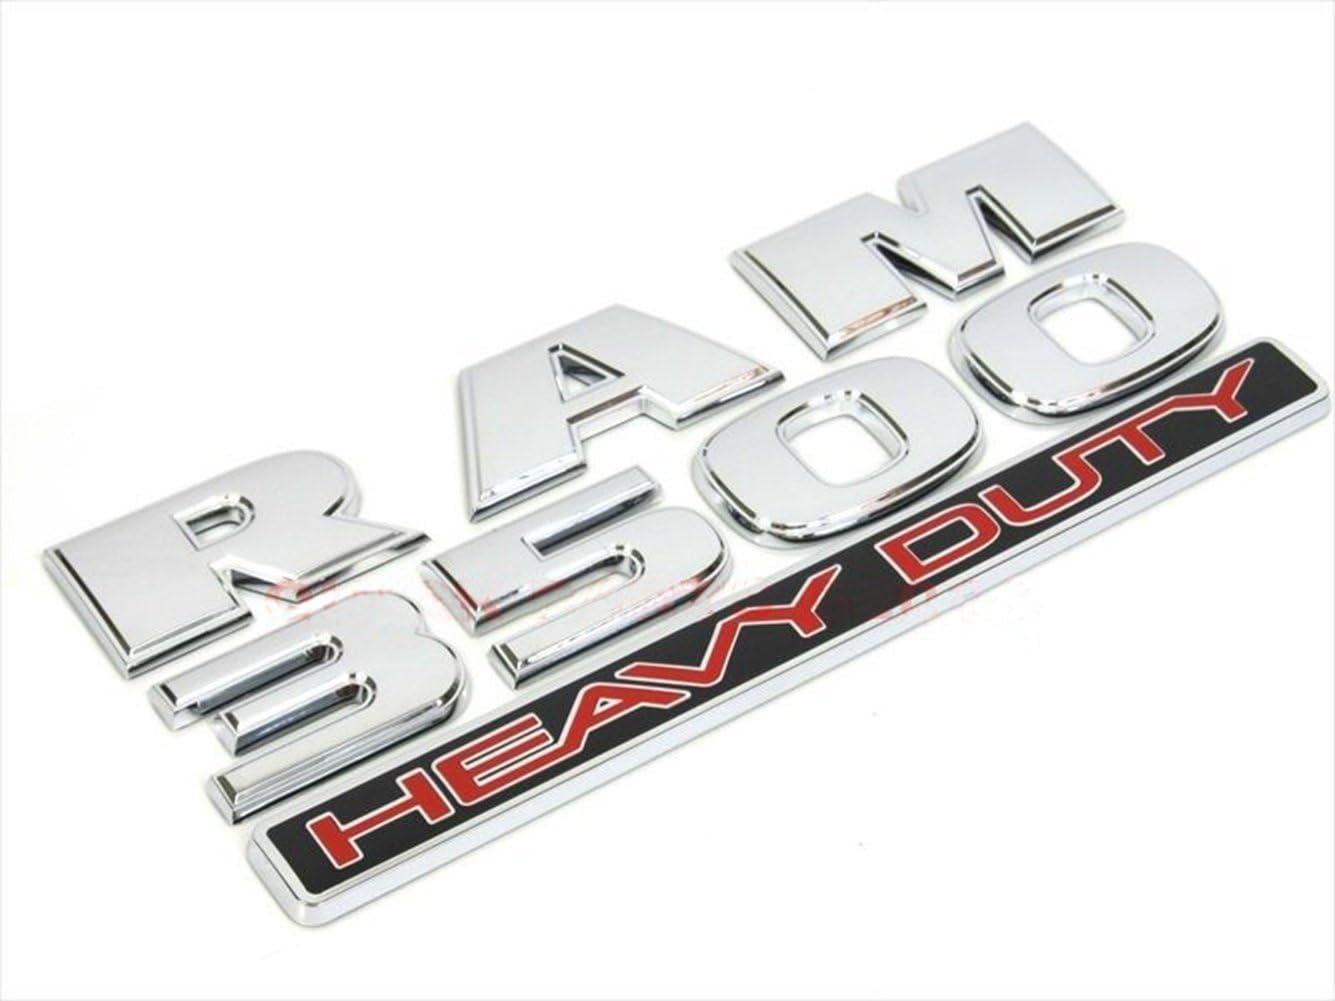 Yoaoo 3x OEM Chrome RAM 3500 HEAVY DUTY Plus 4x4 Emblem Badge 3D Emblem Decal Nameplates Flat Letter New Matte